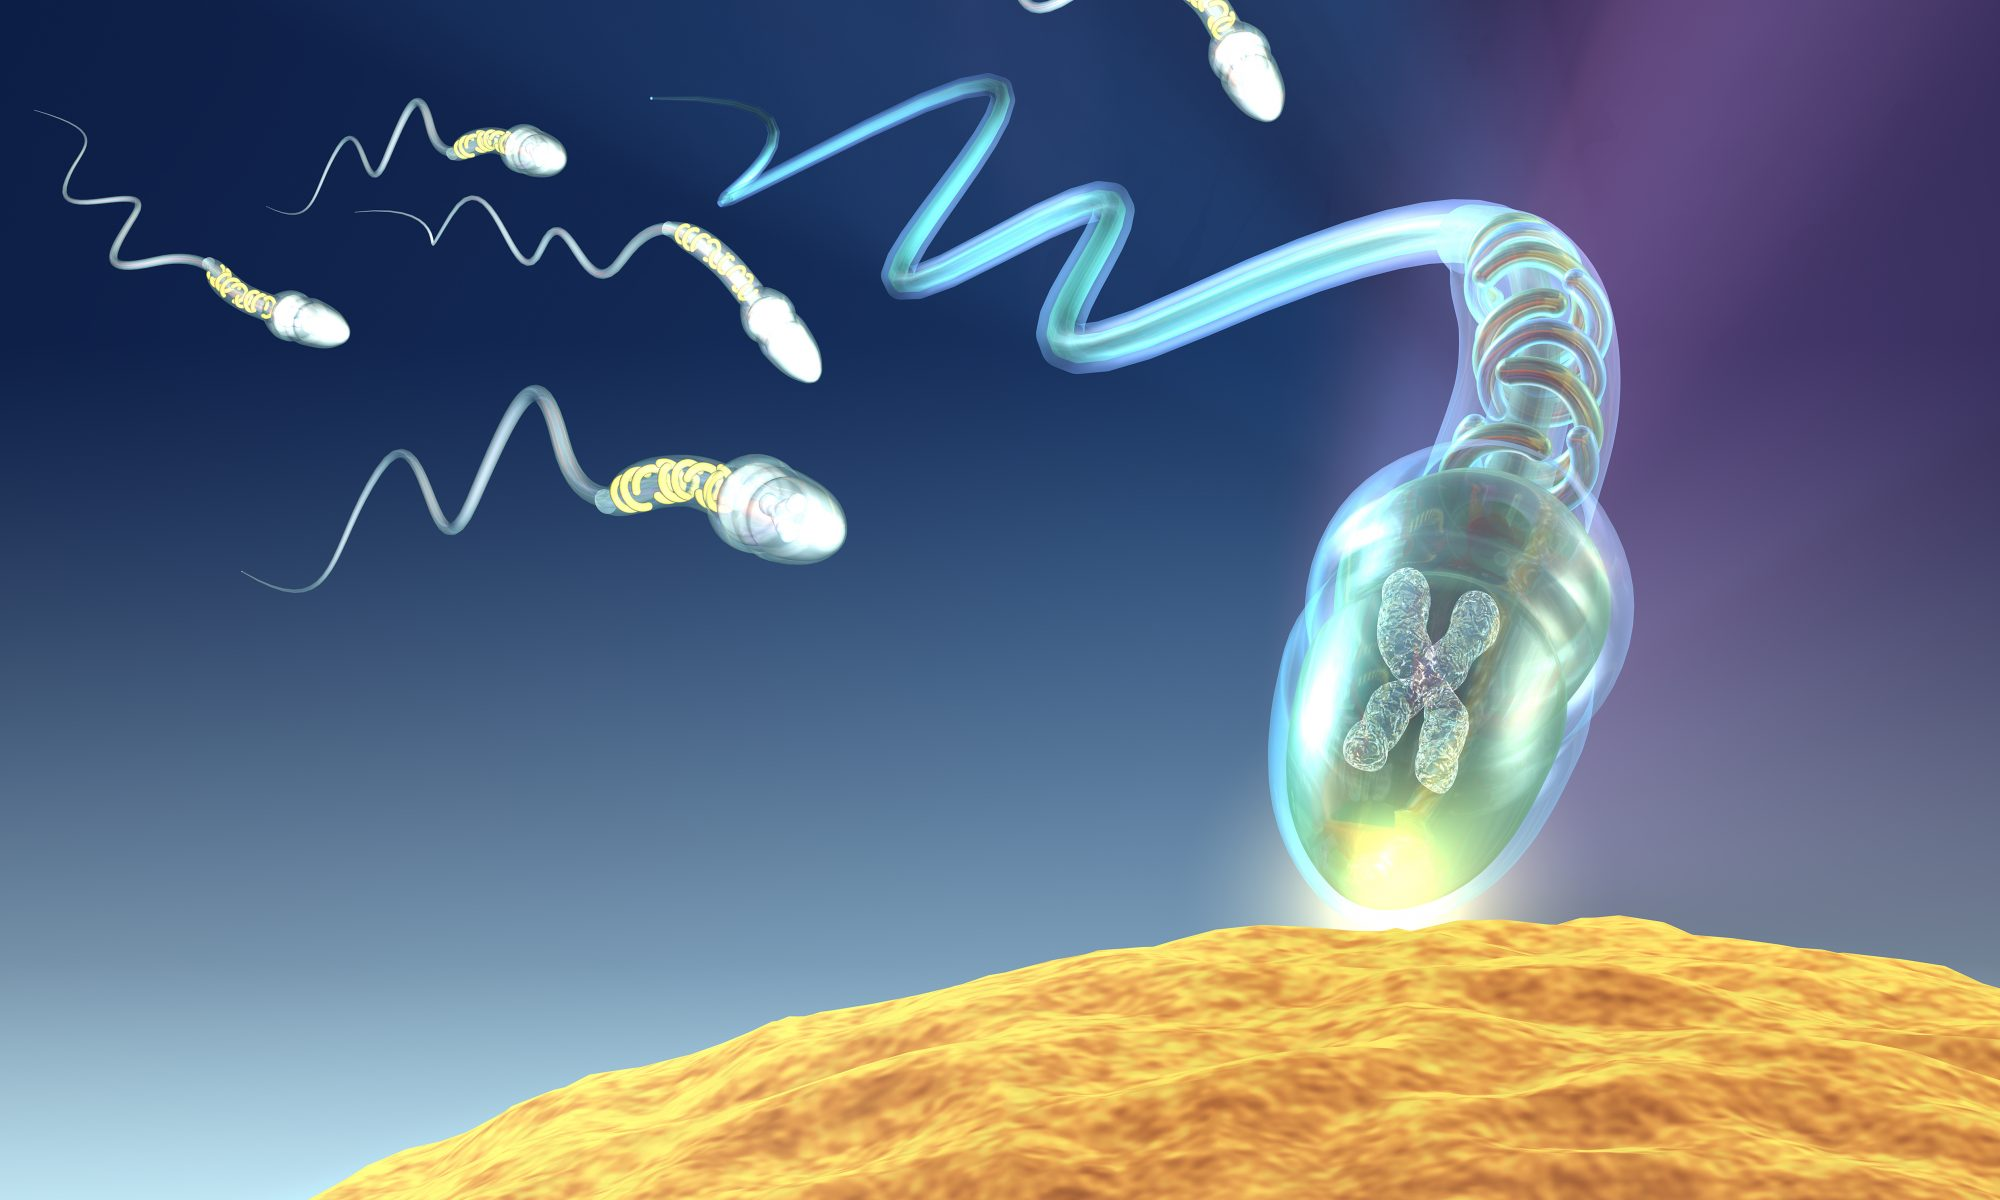 A sperm fertilizing an egg. (iStockphoto/Thinkstock)